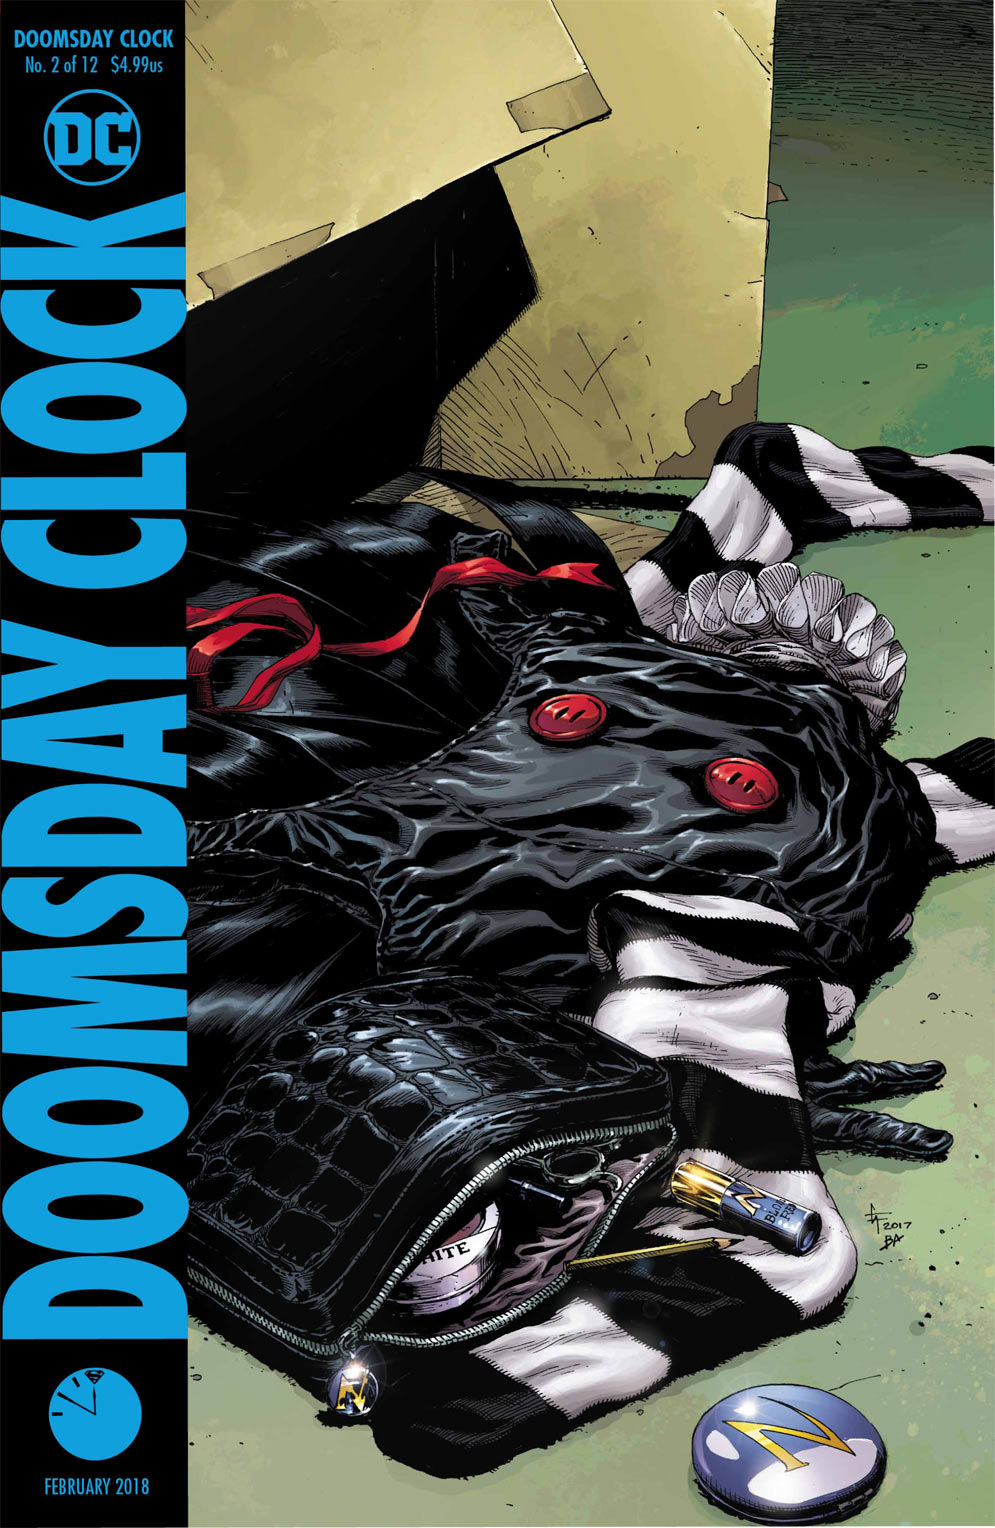 Doomsday Clock Cover #2 - DC Comics News